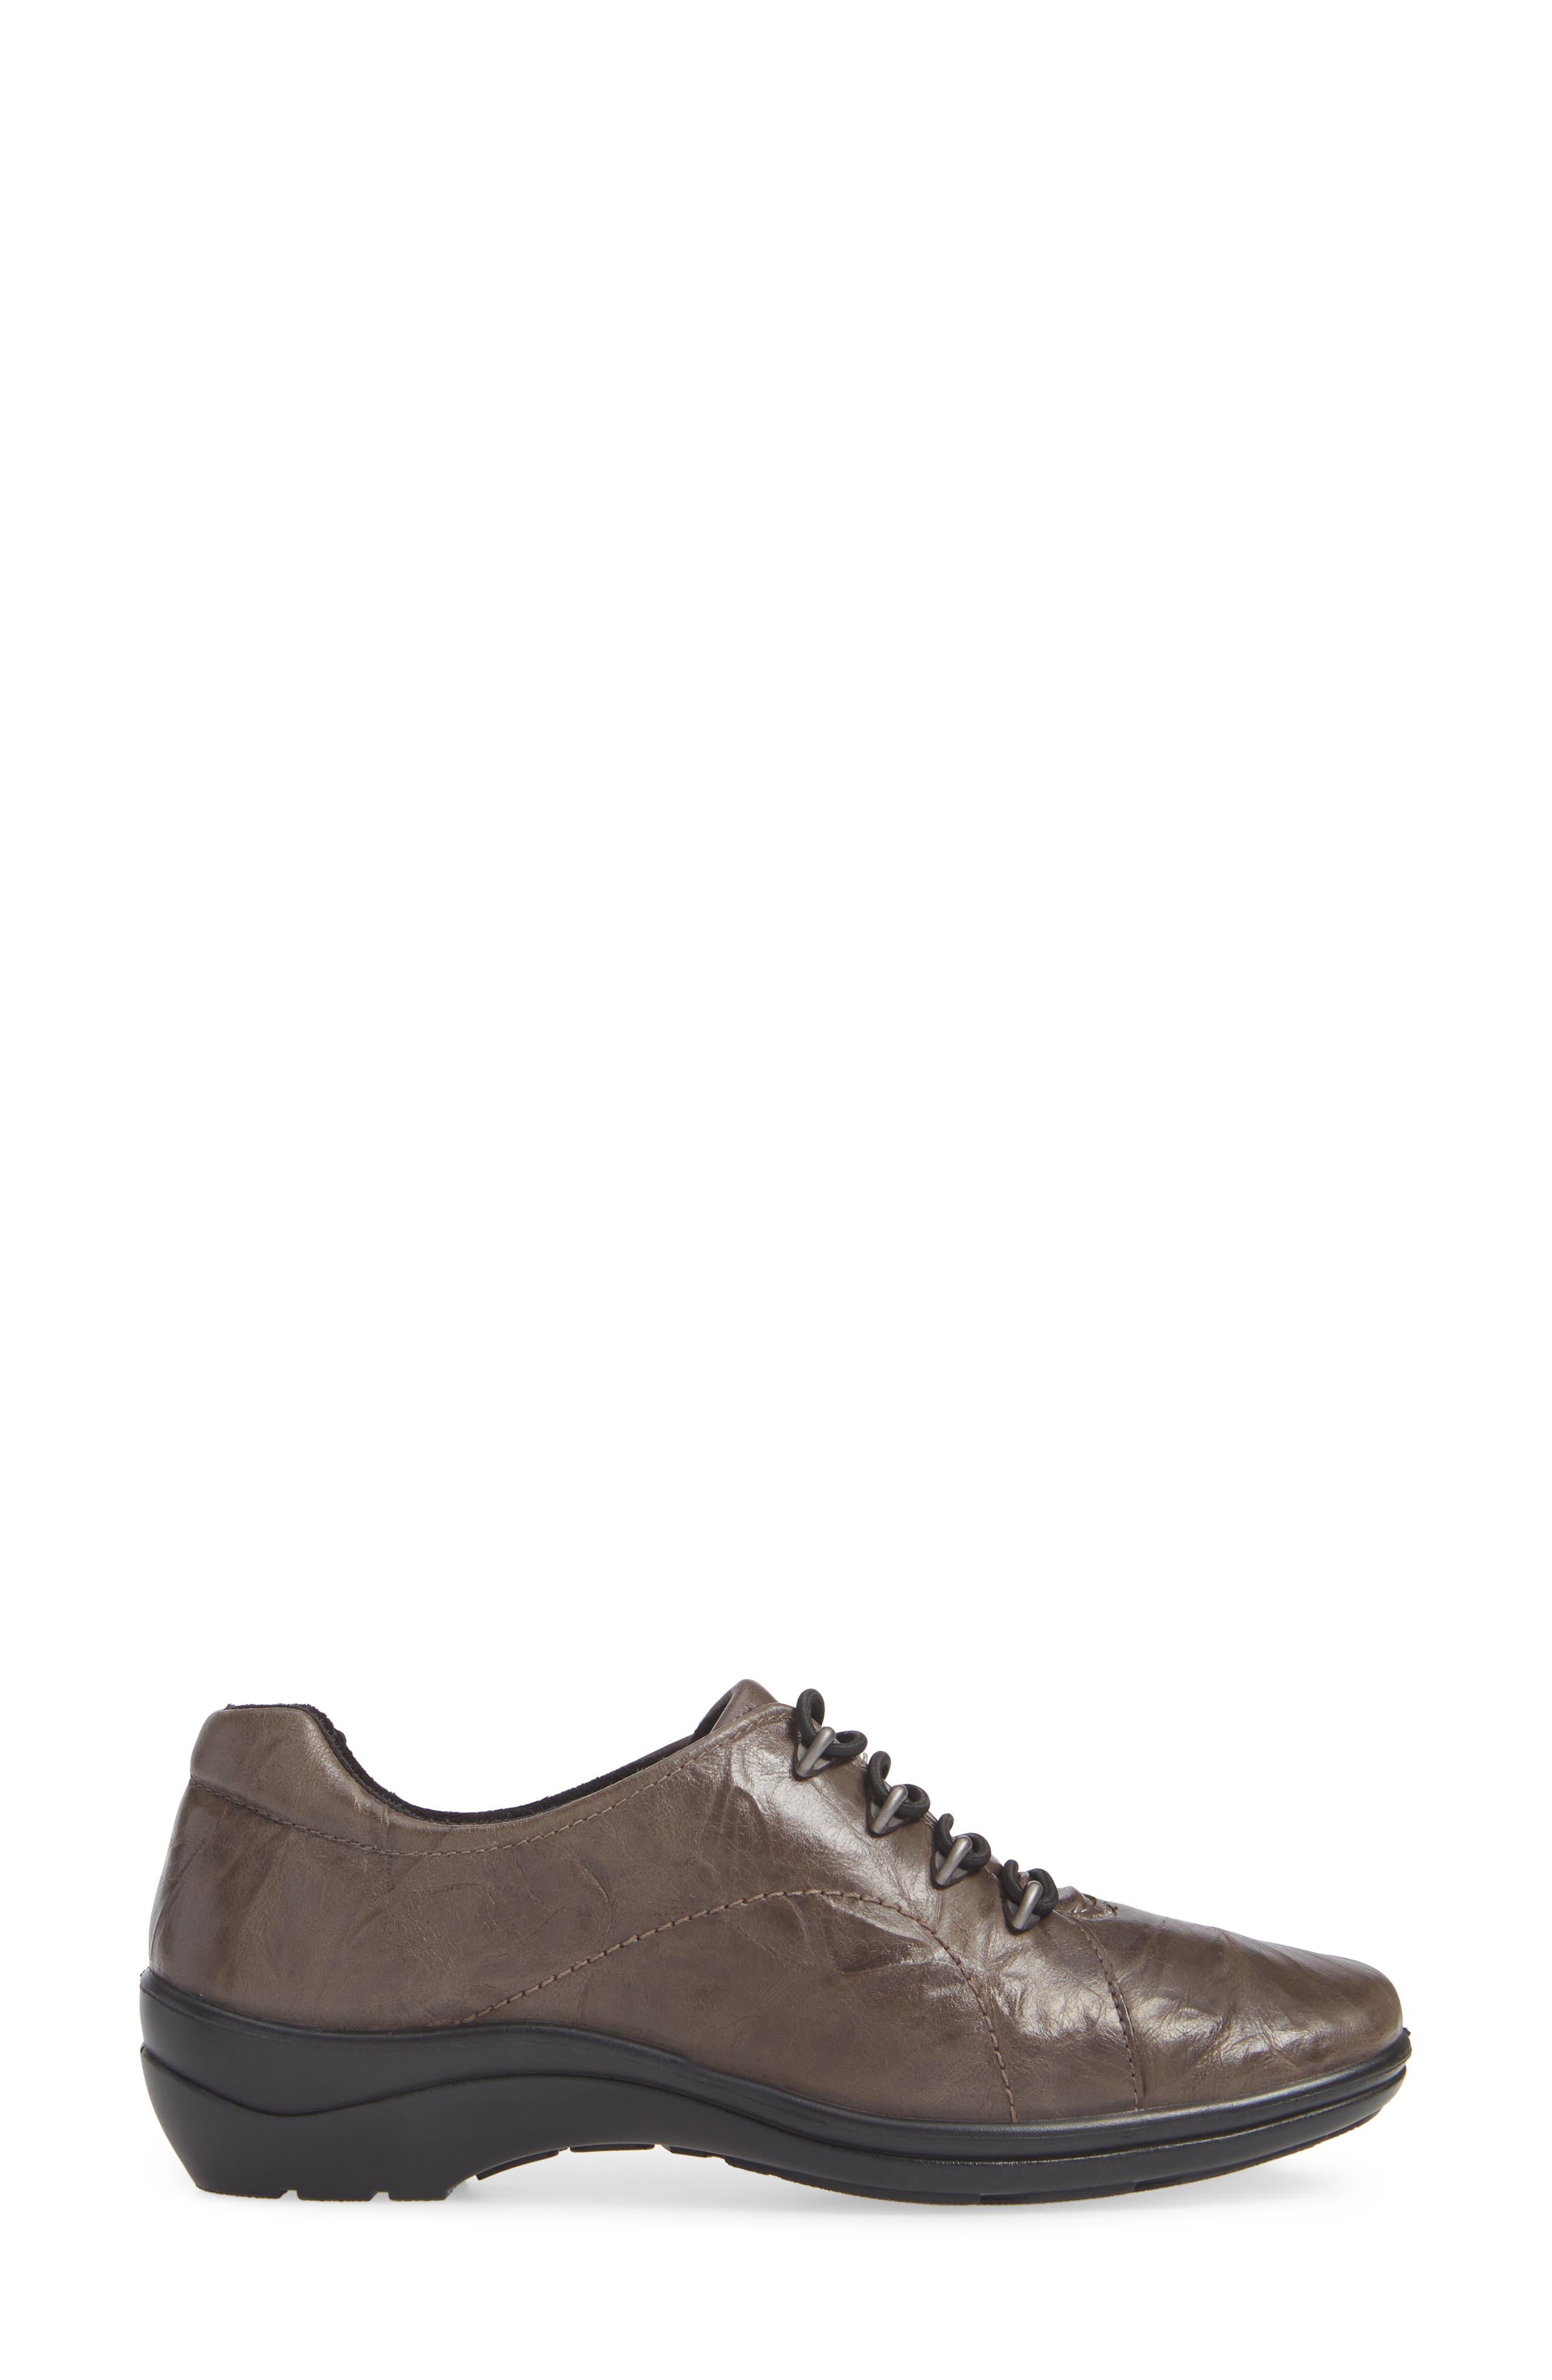 Cassie 42 Sneaker,                             Alternate thumbnail 3, color,                             GRAPHITE LEATHER